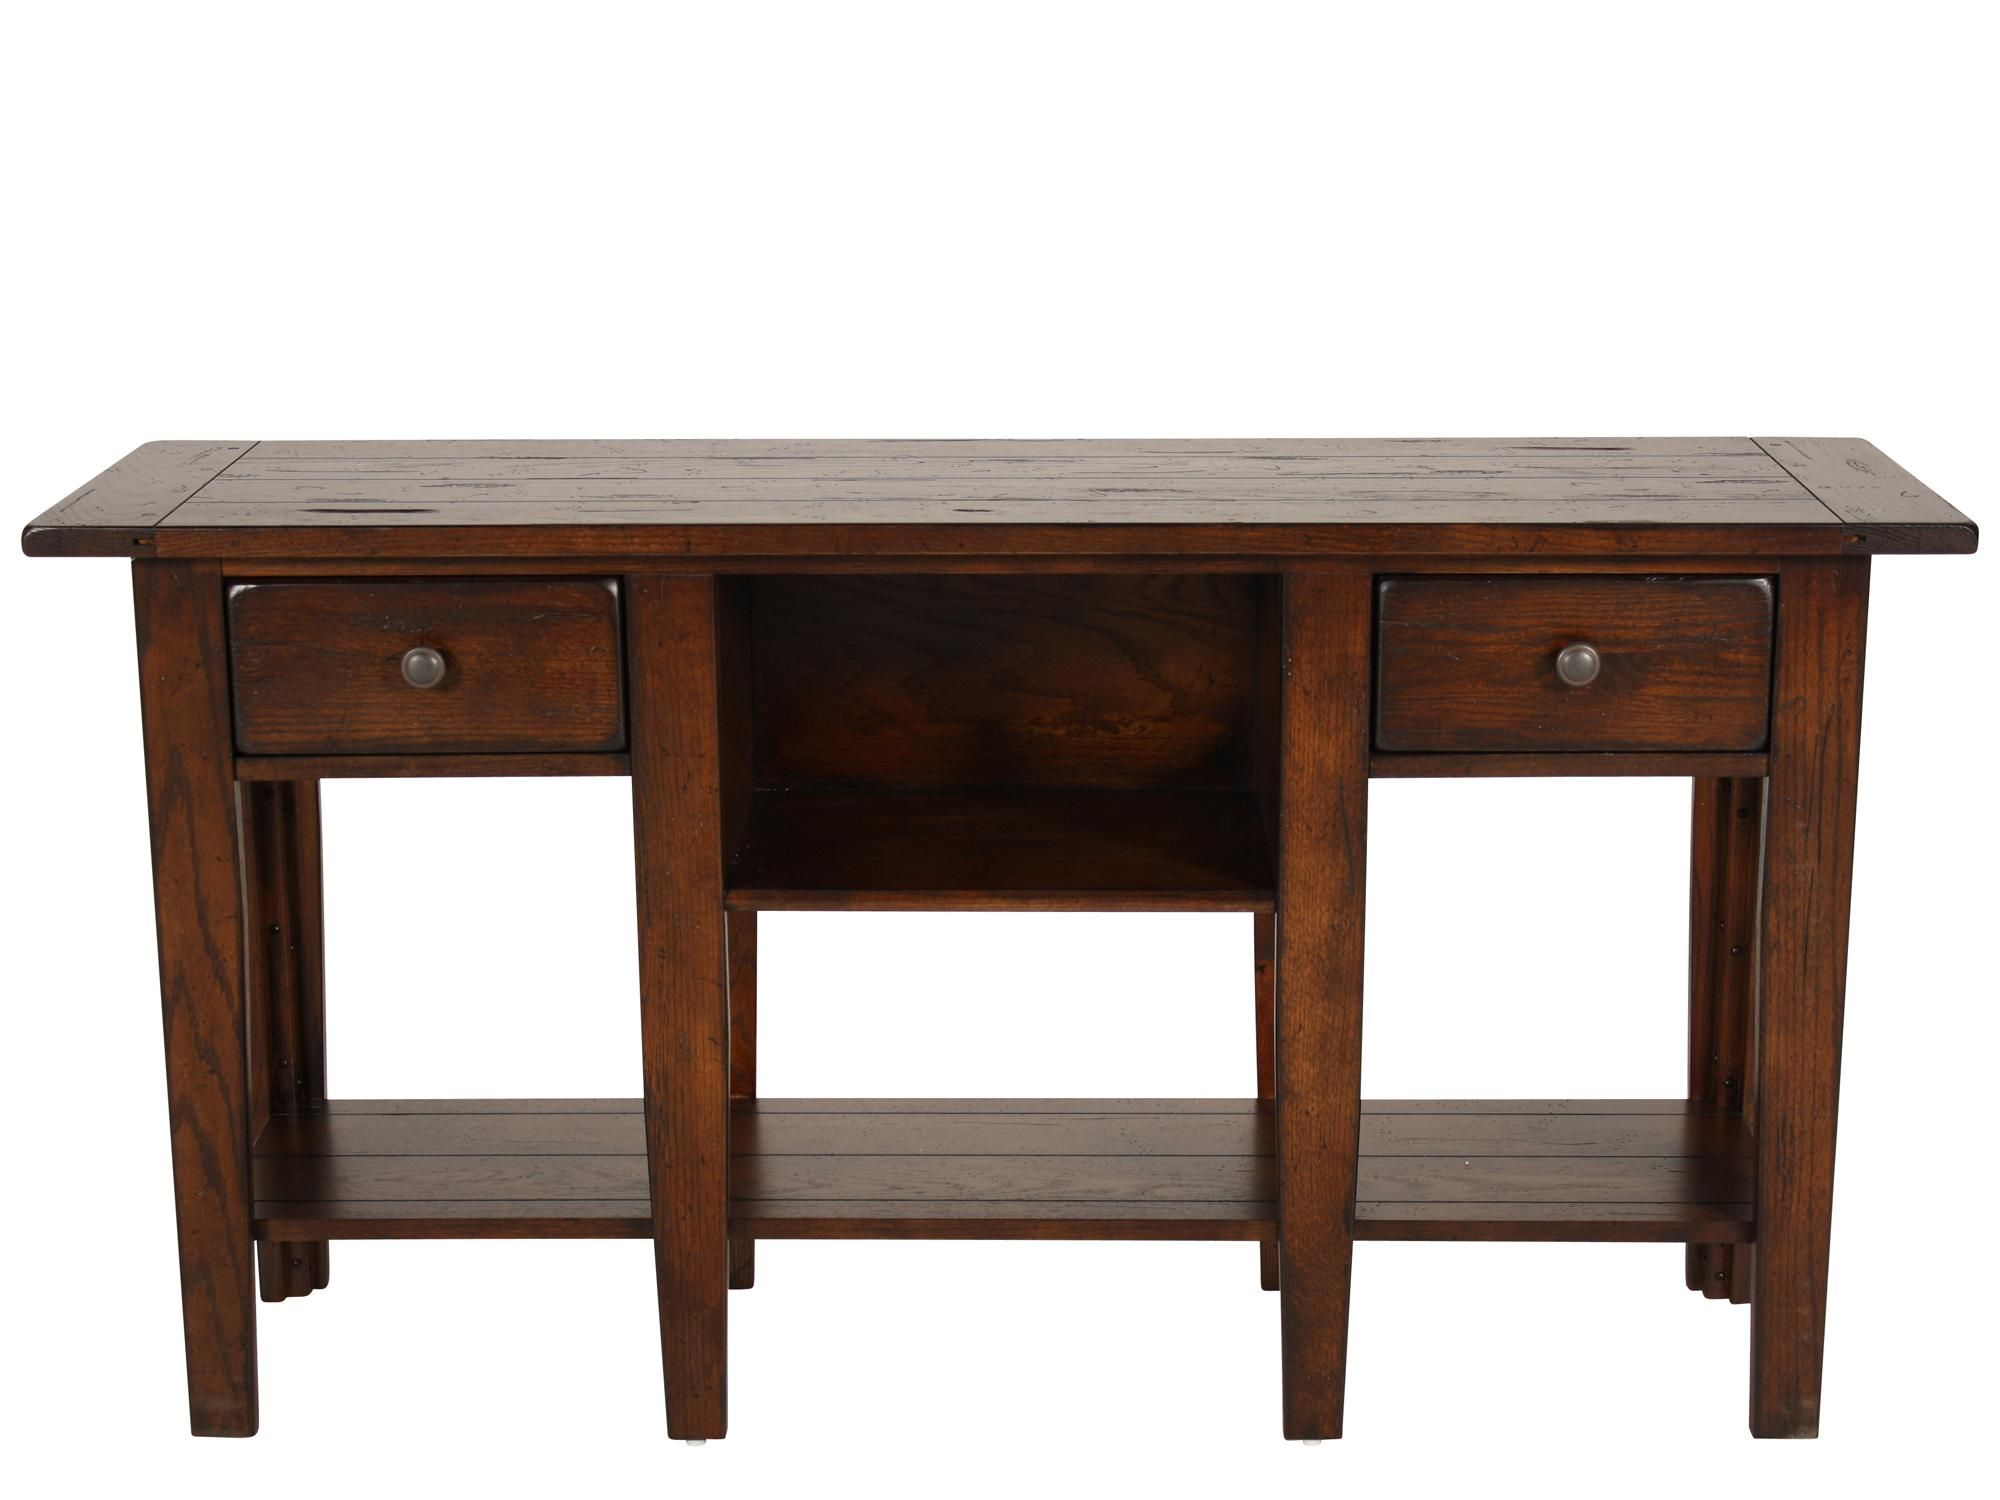 Broyhill Attic Heirlooms Rustic Sofa Table Rustic Sofa Tables Sofa Table Country Sofas